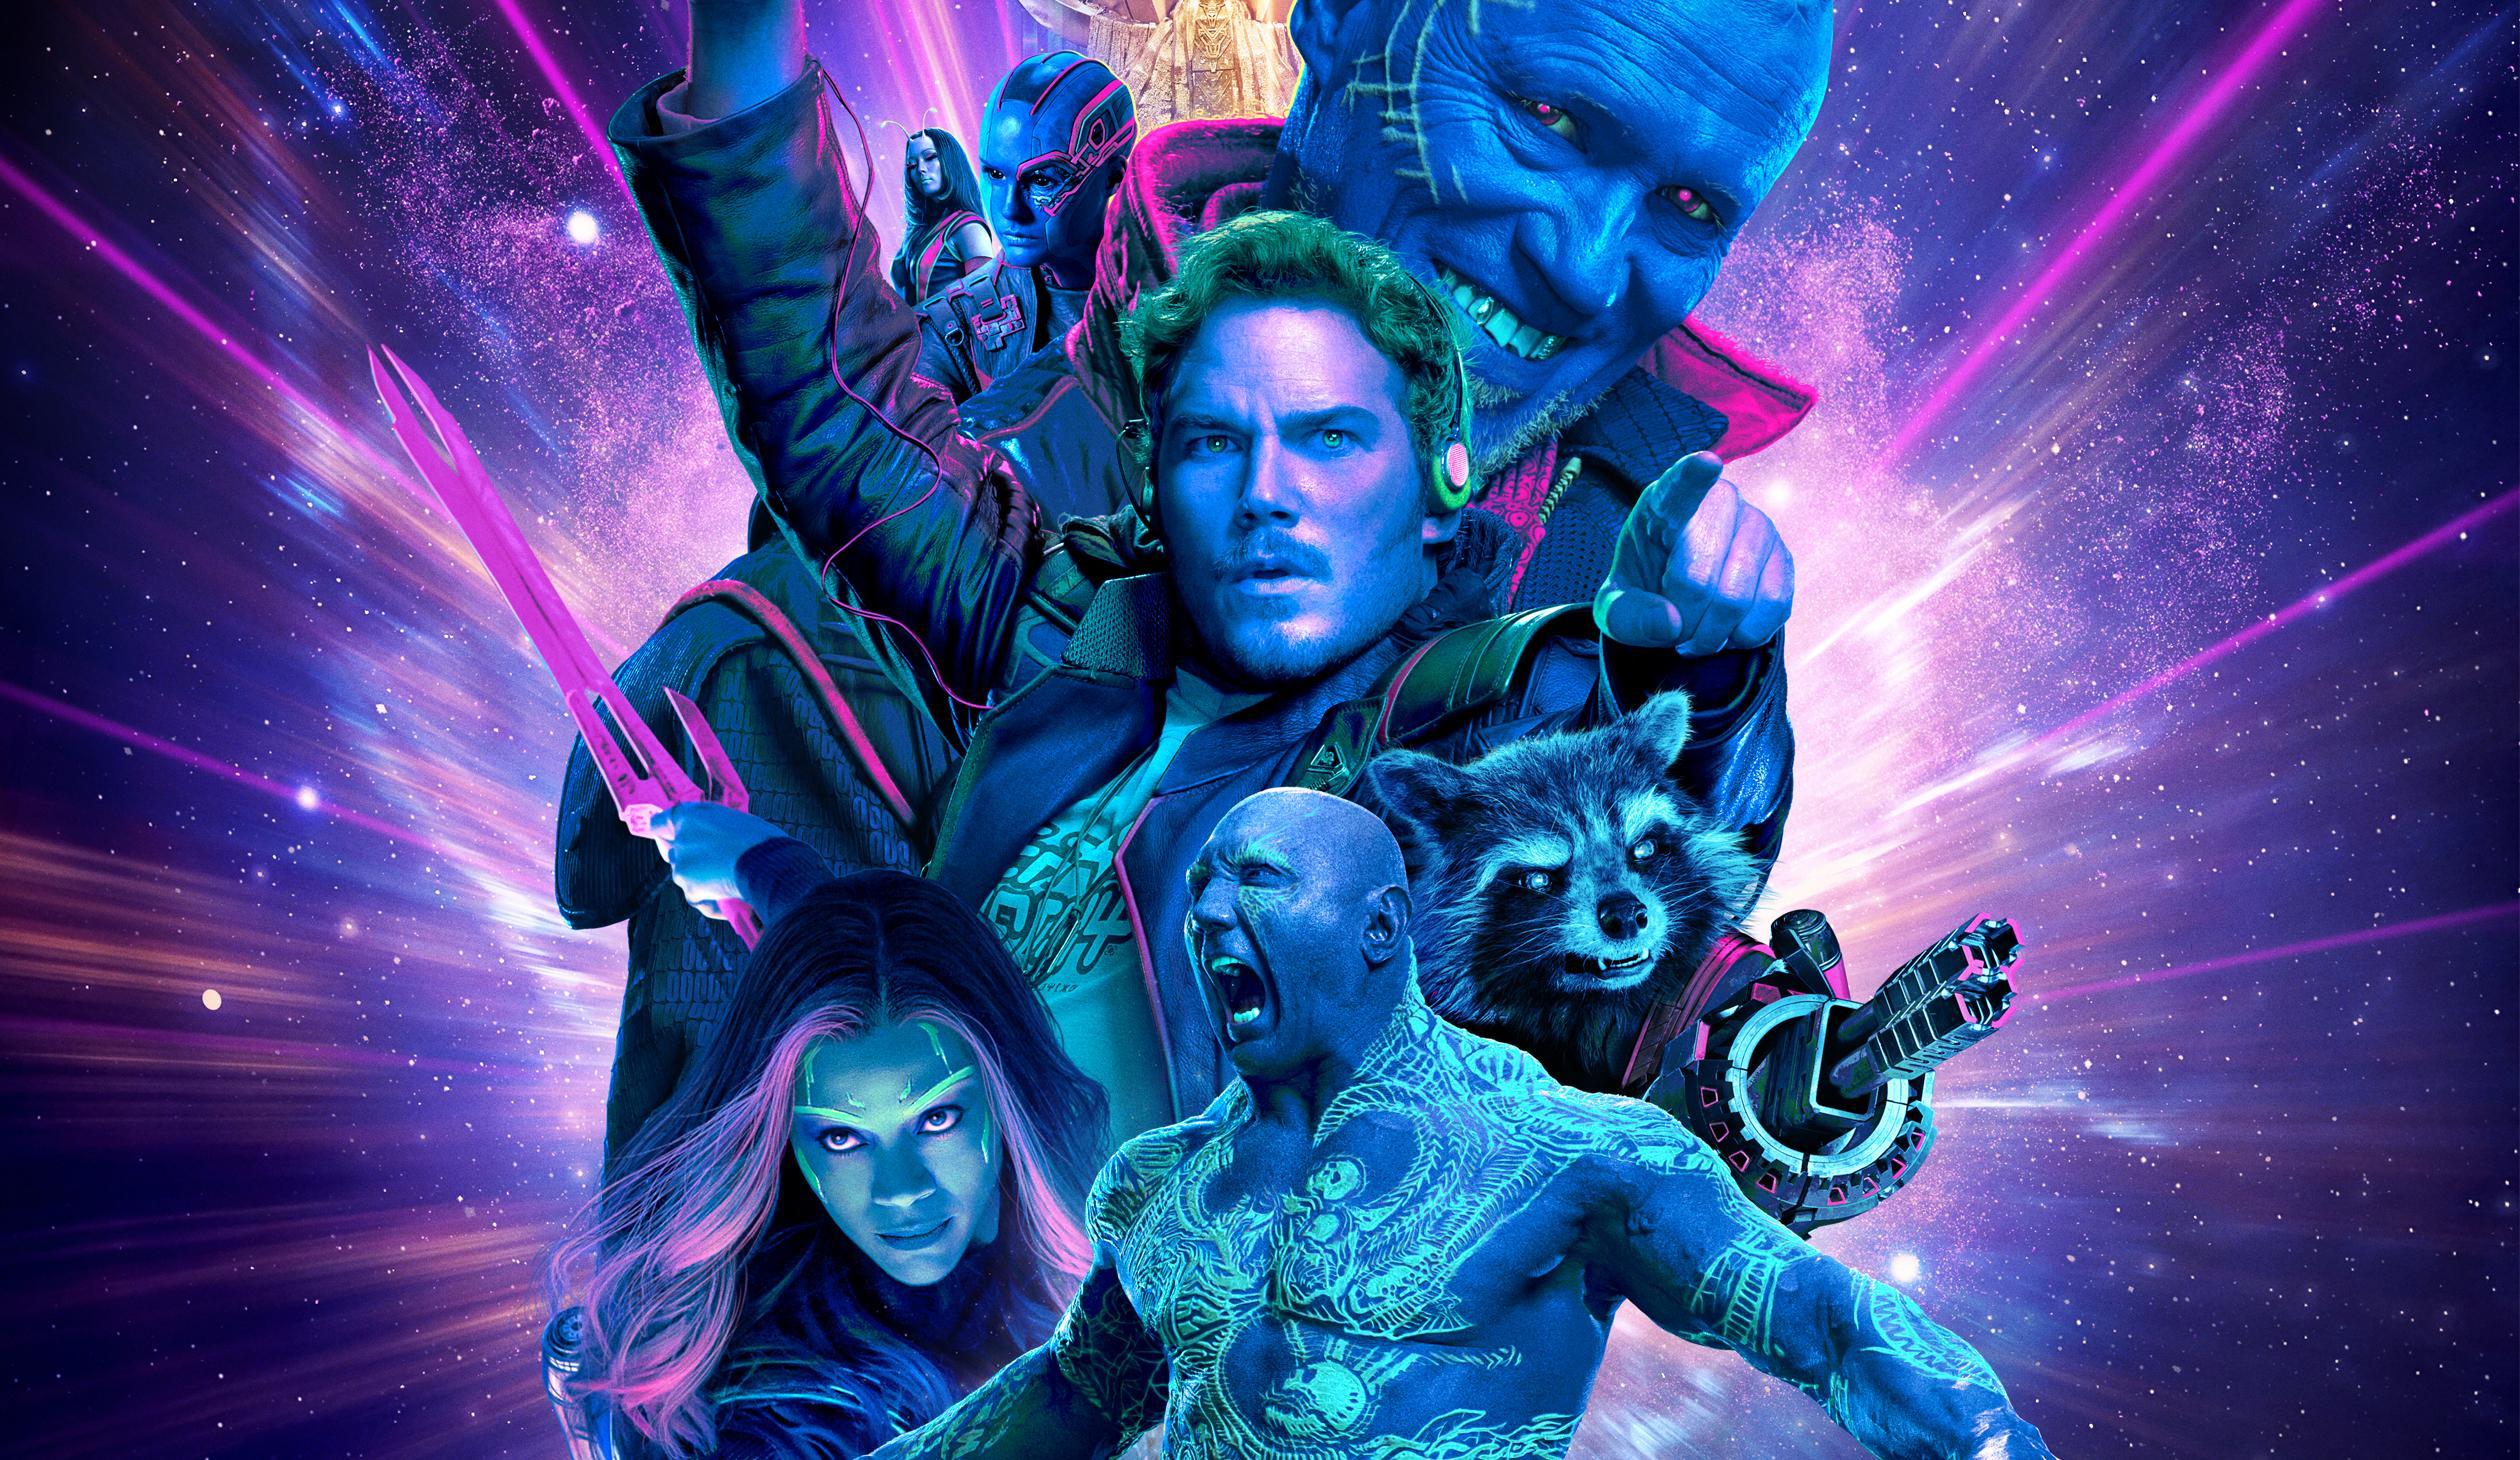 Guardians Of The Galaxy Vol 2 Imax, HD Movies, 4k